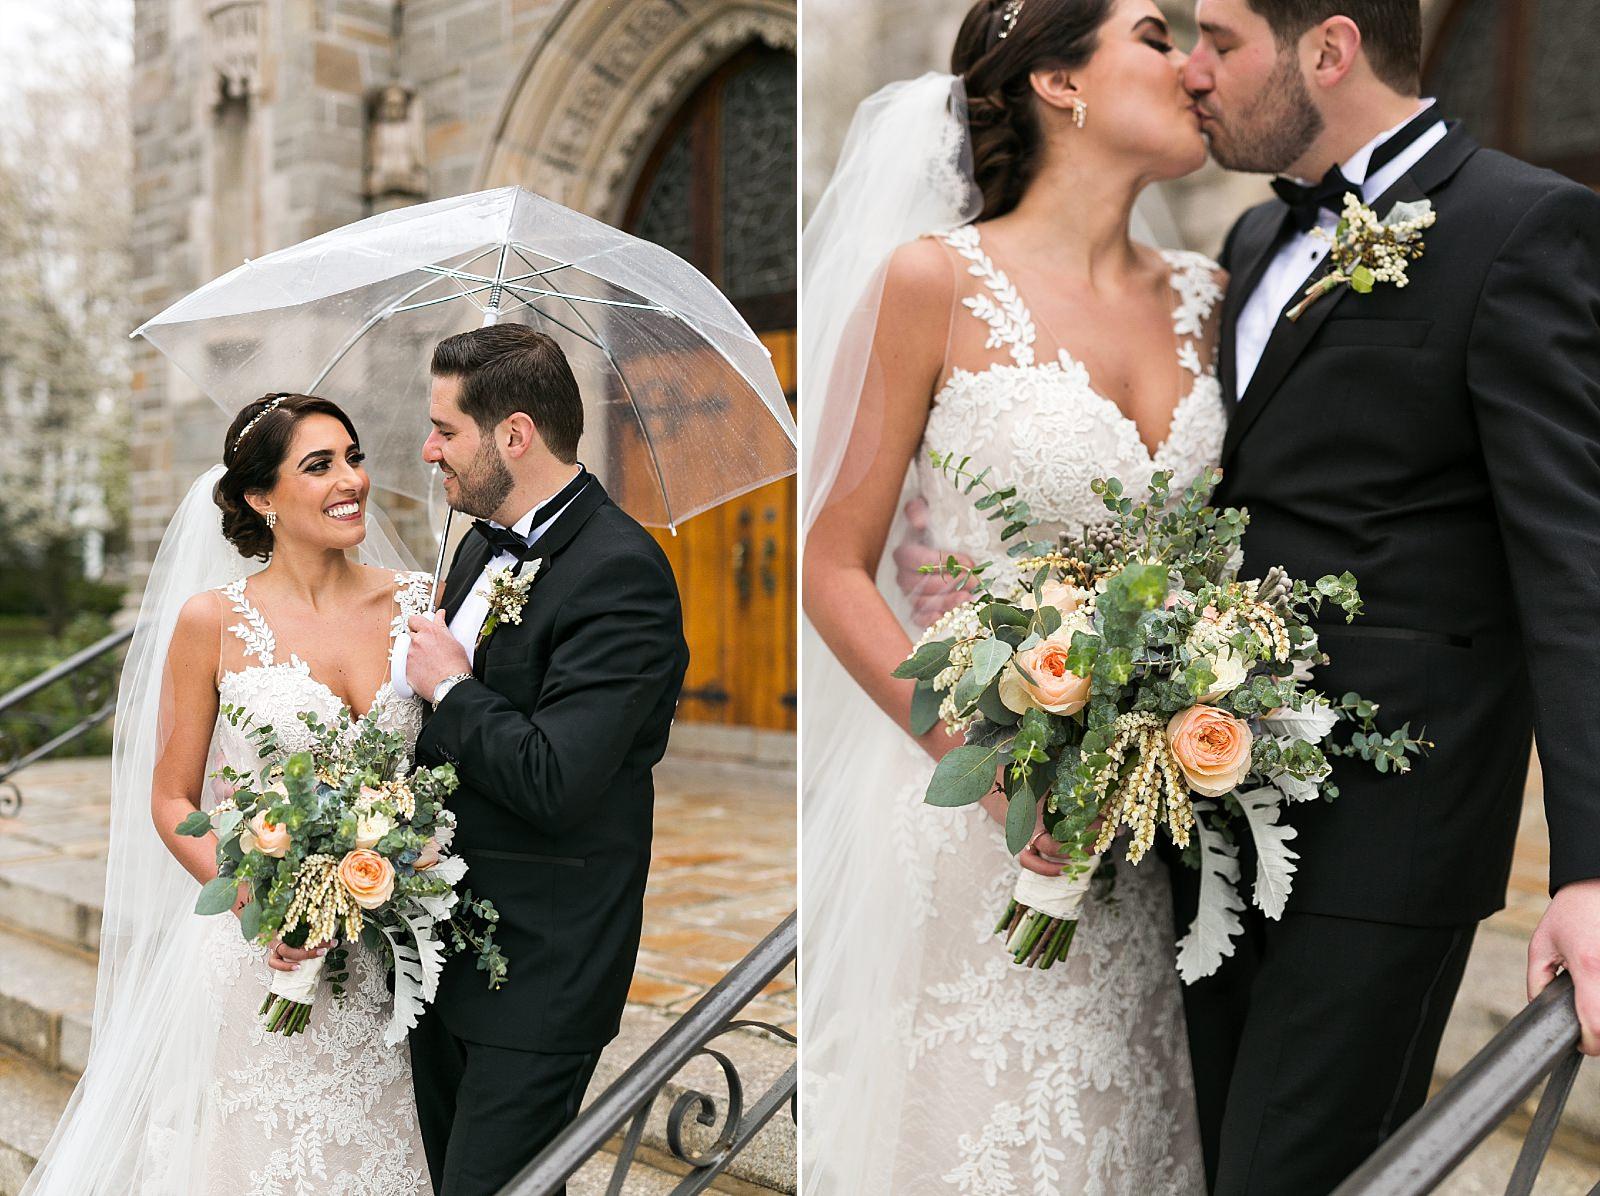 NY_Wedding_Photographer_NiPe_23.jpg